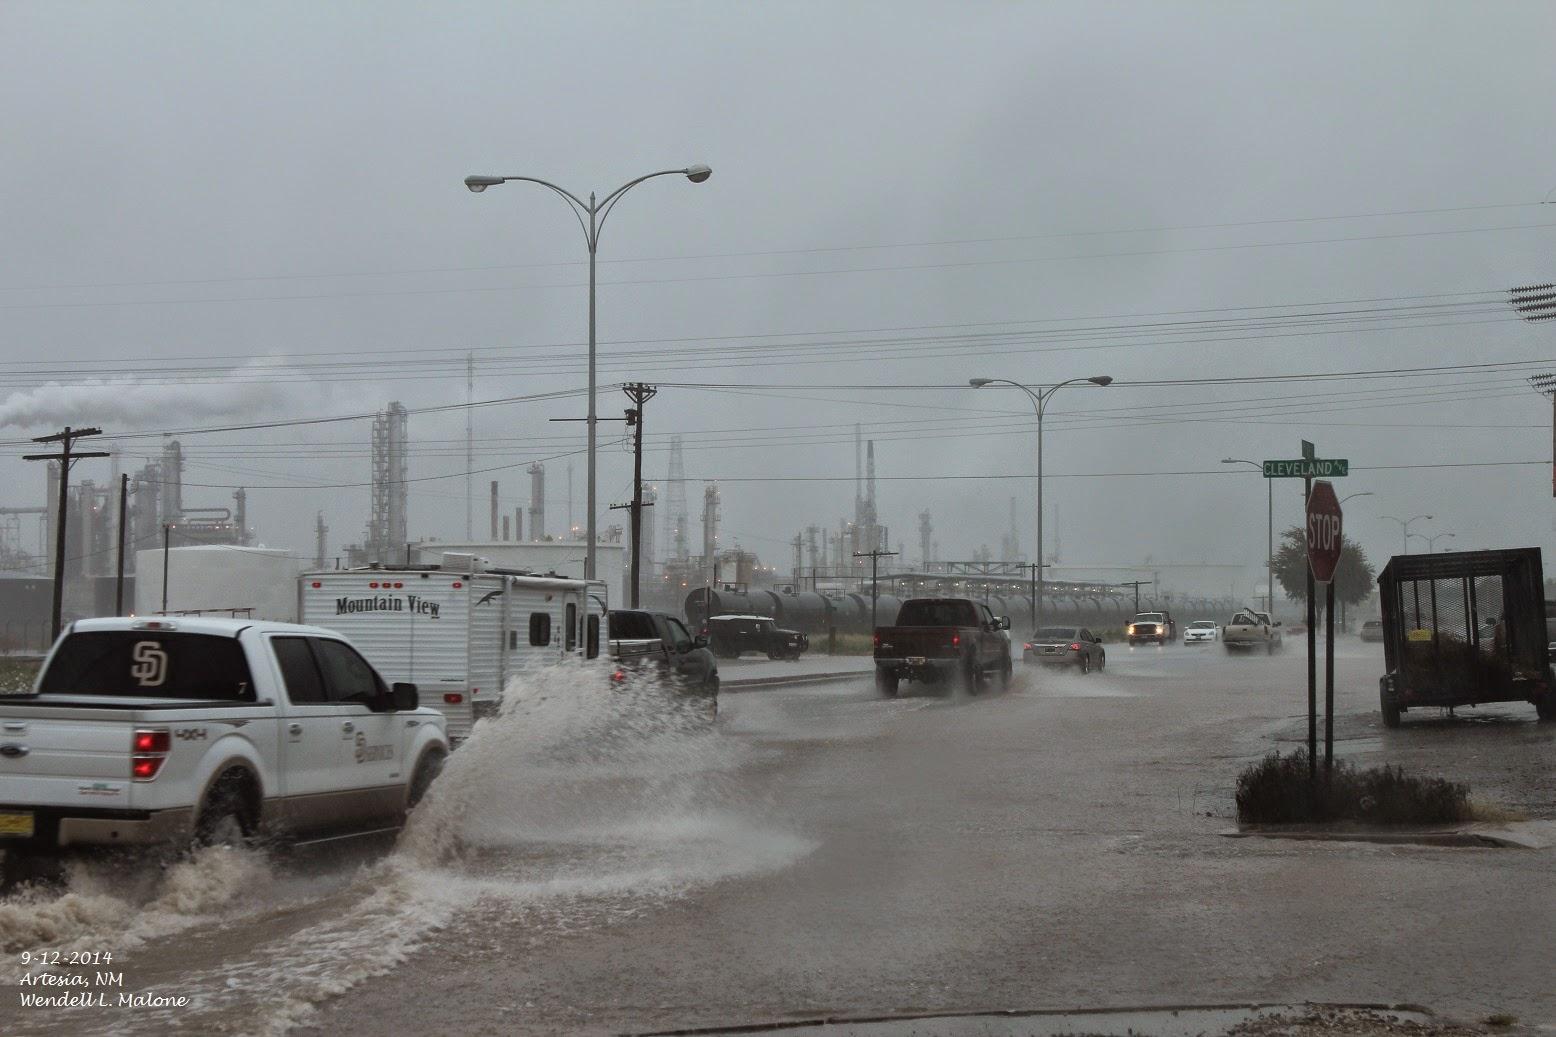 Flash flooding in eddy co nm 9 12 2014 200 midland nws radar estimated rainfall totals publicscrutiny Choice Image